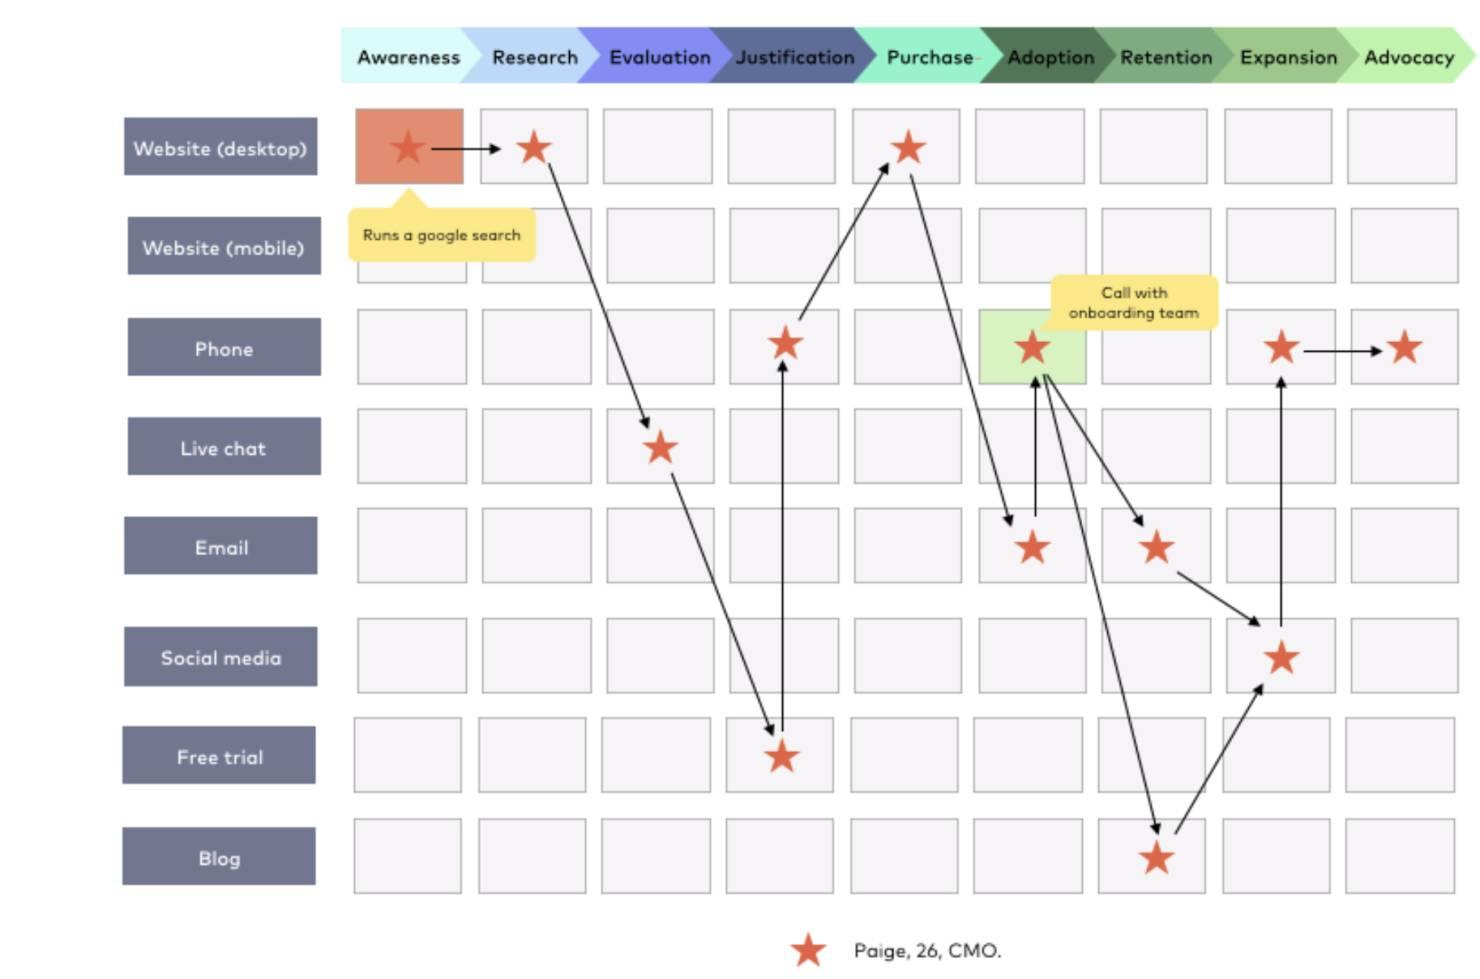 Aircallio customer journey map for b2b companies